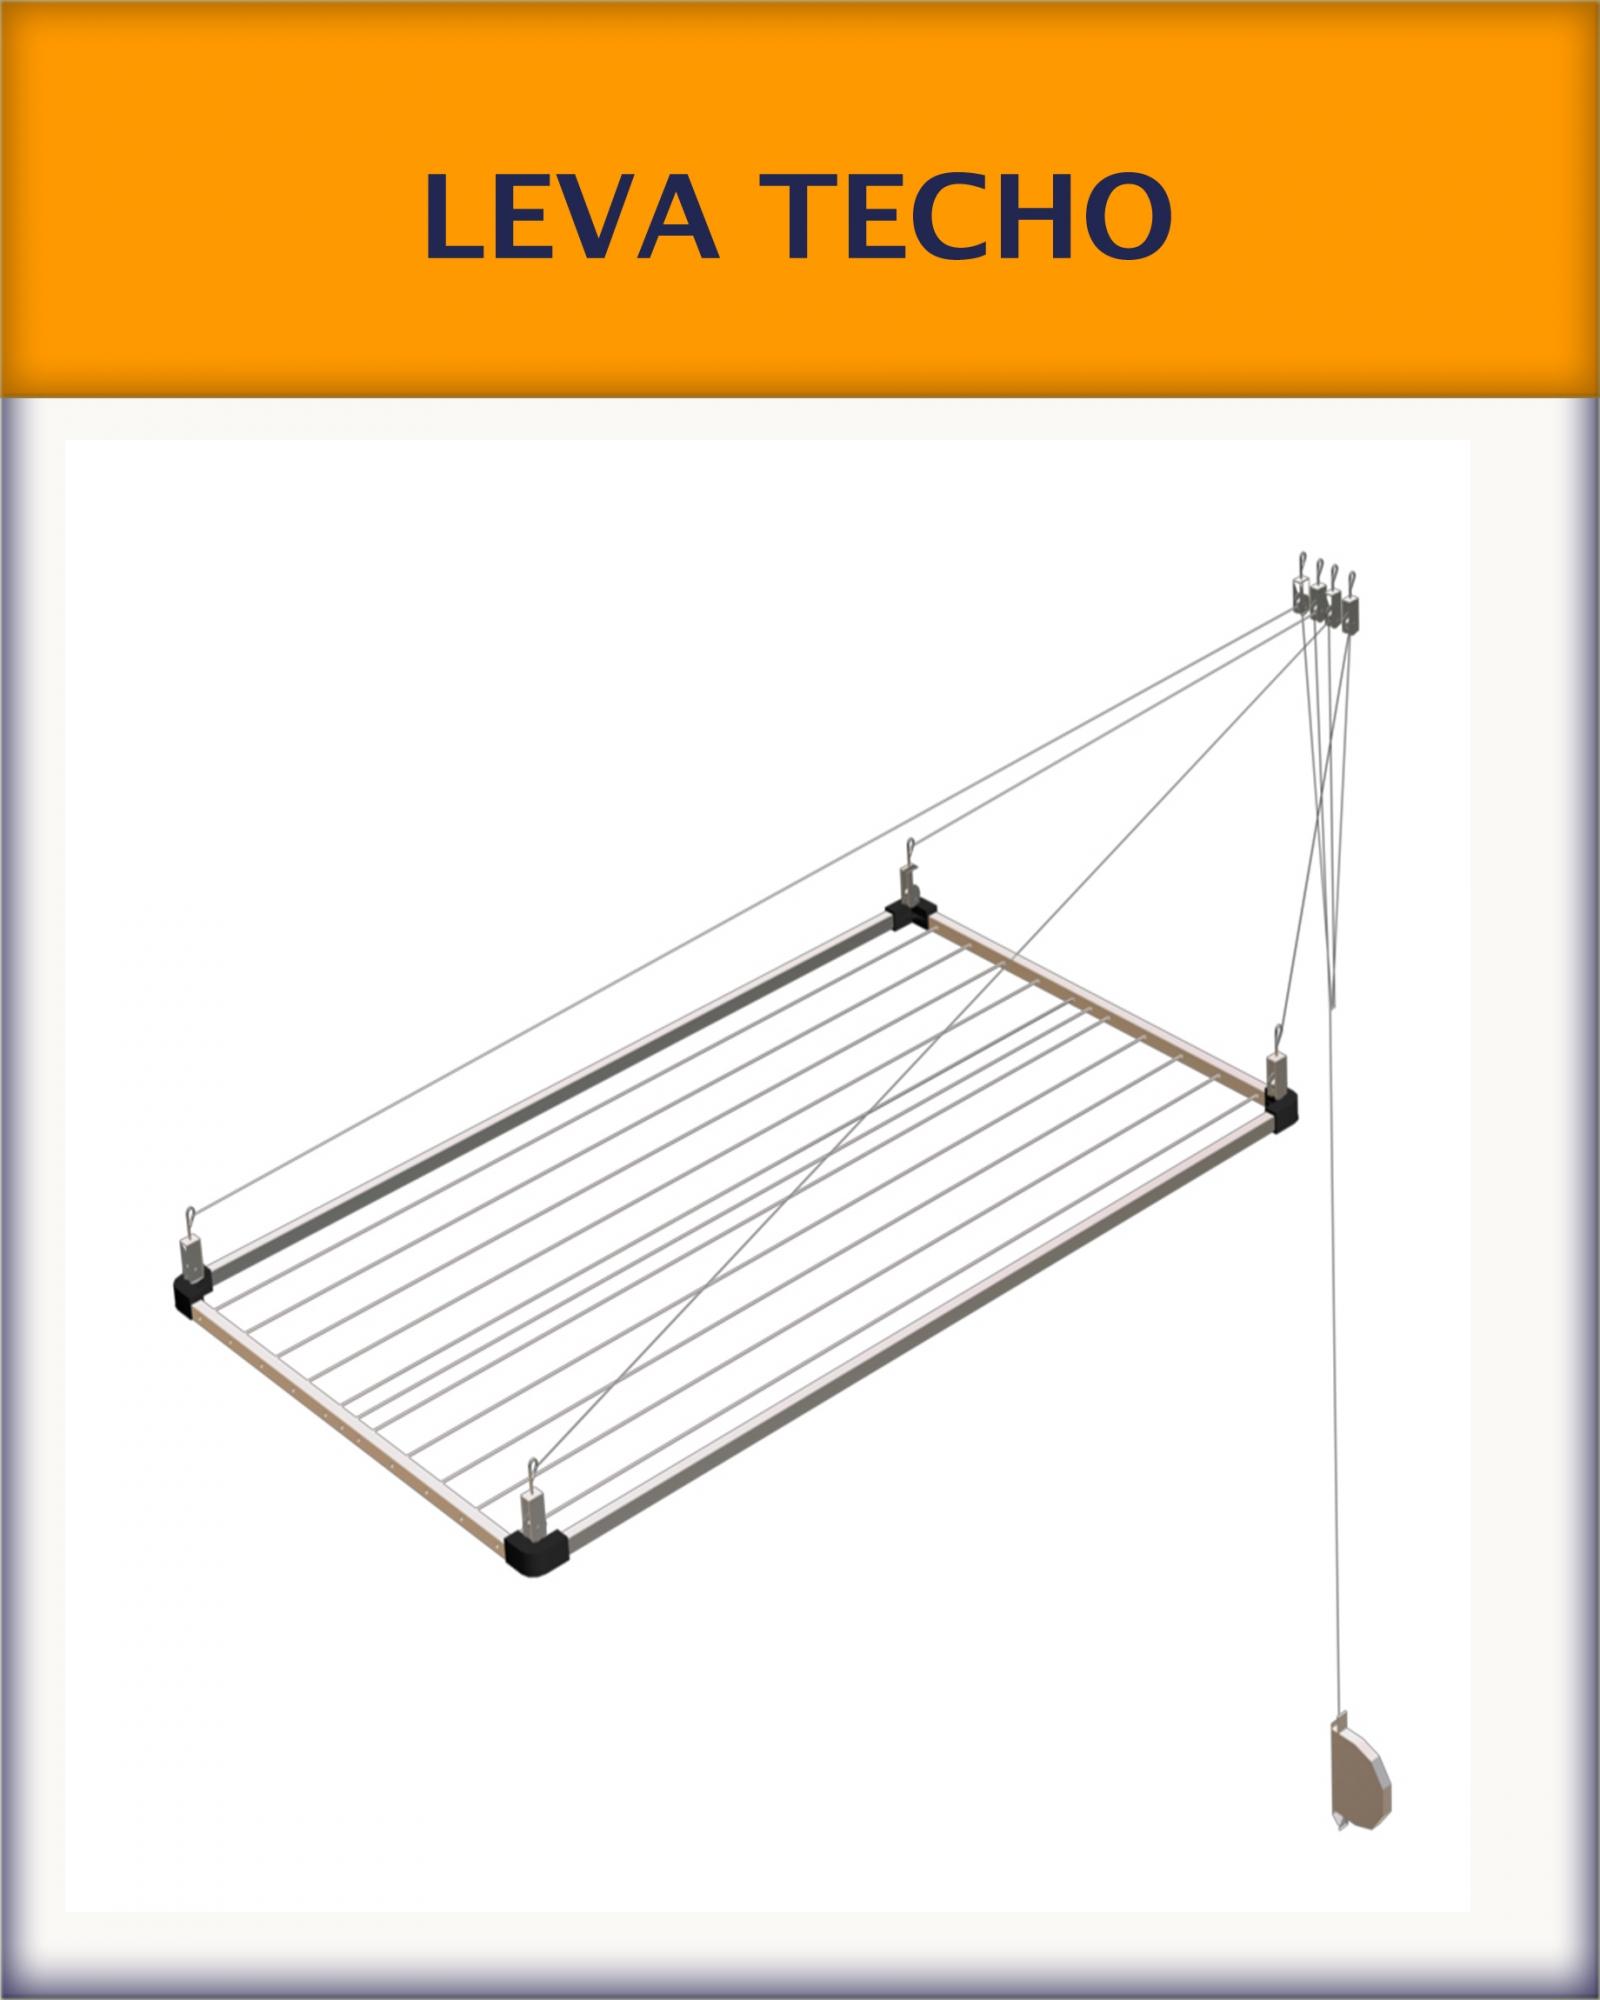 tendederos de techo superleva, leva reforzado, tendedero de techo-pared